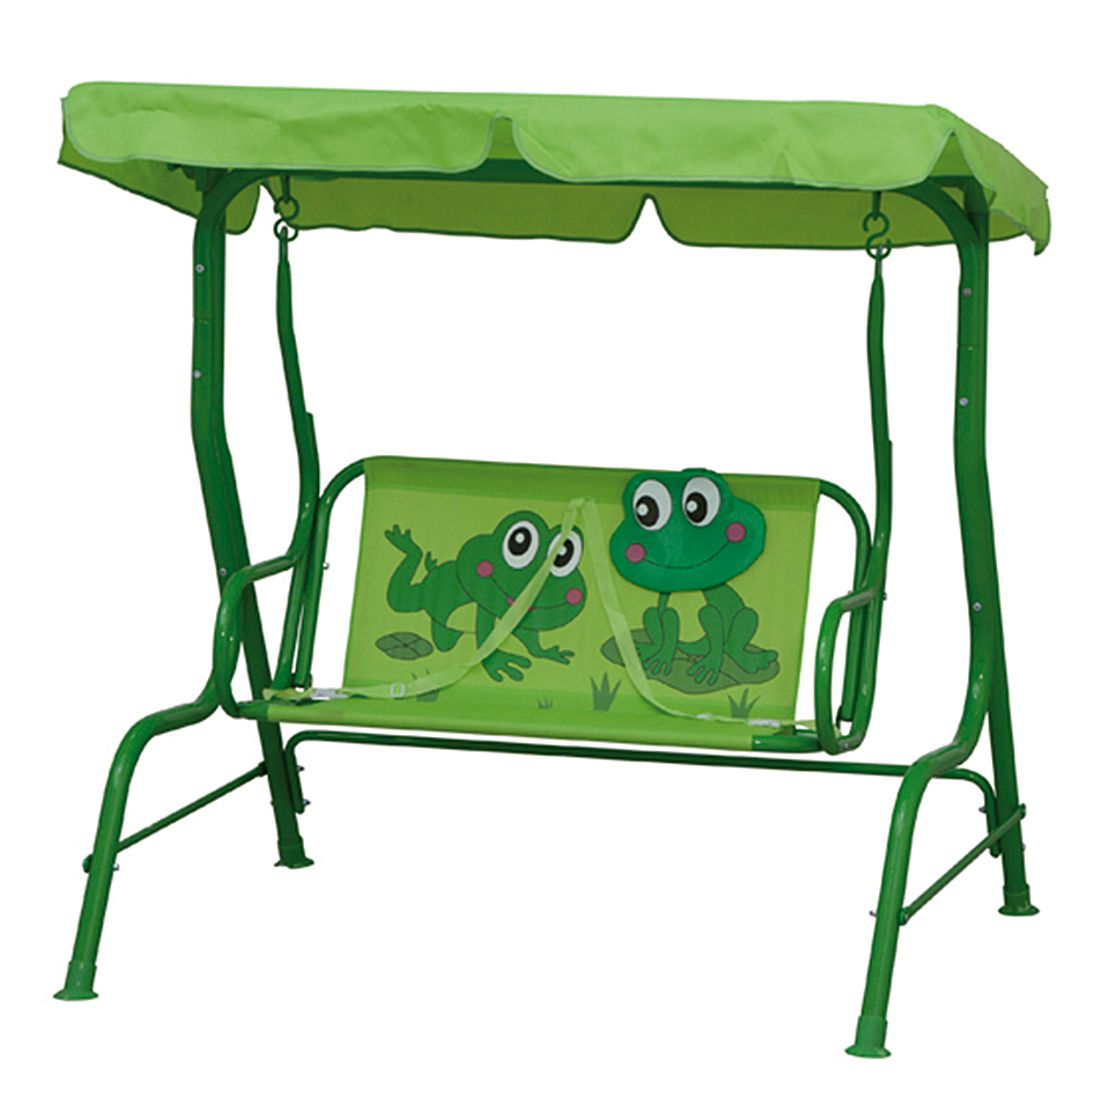 Hollywoodschaukel Froggy - Stahl/Polyester - Grün/Froschmotiv, Siena Garden